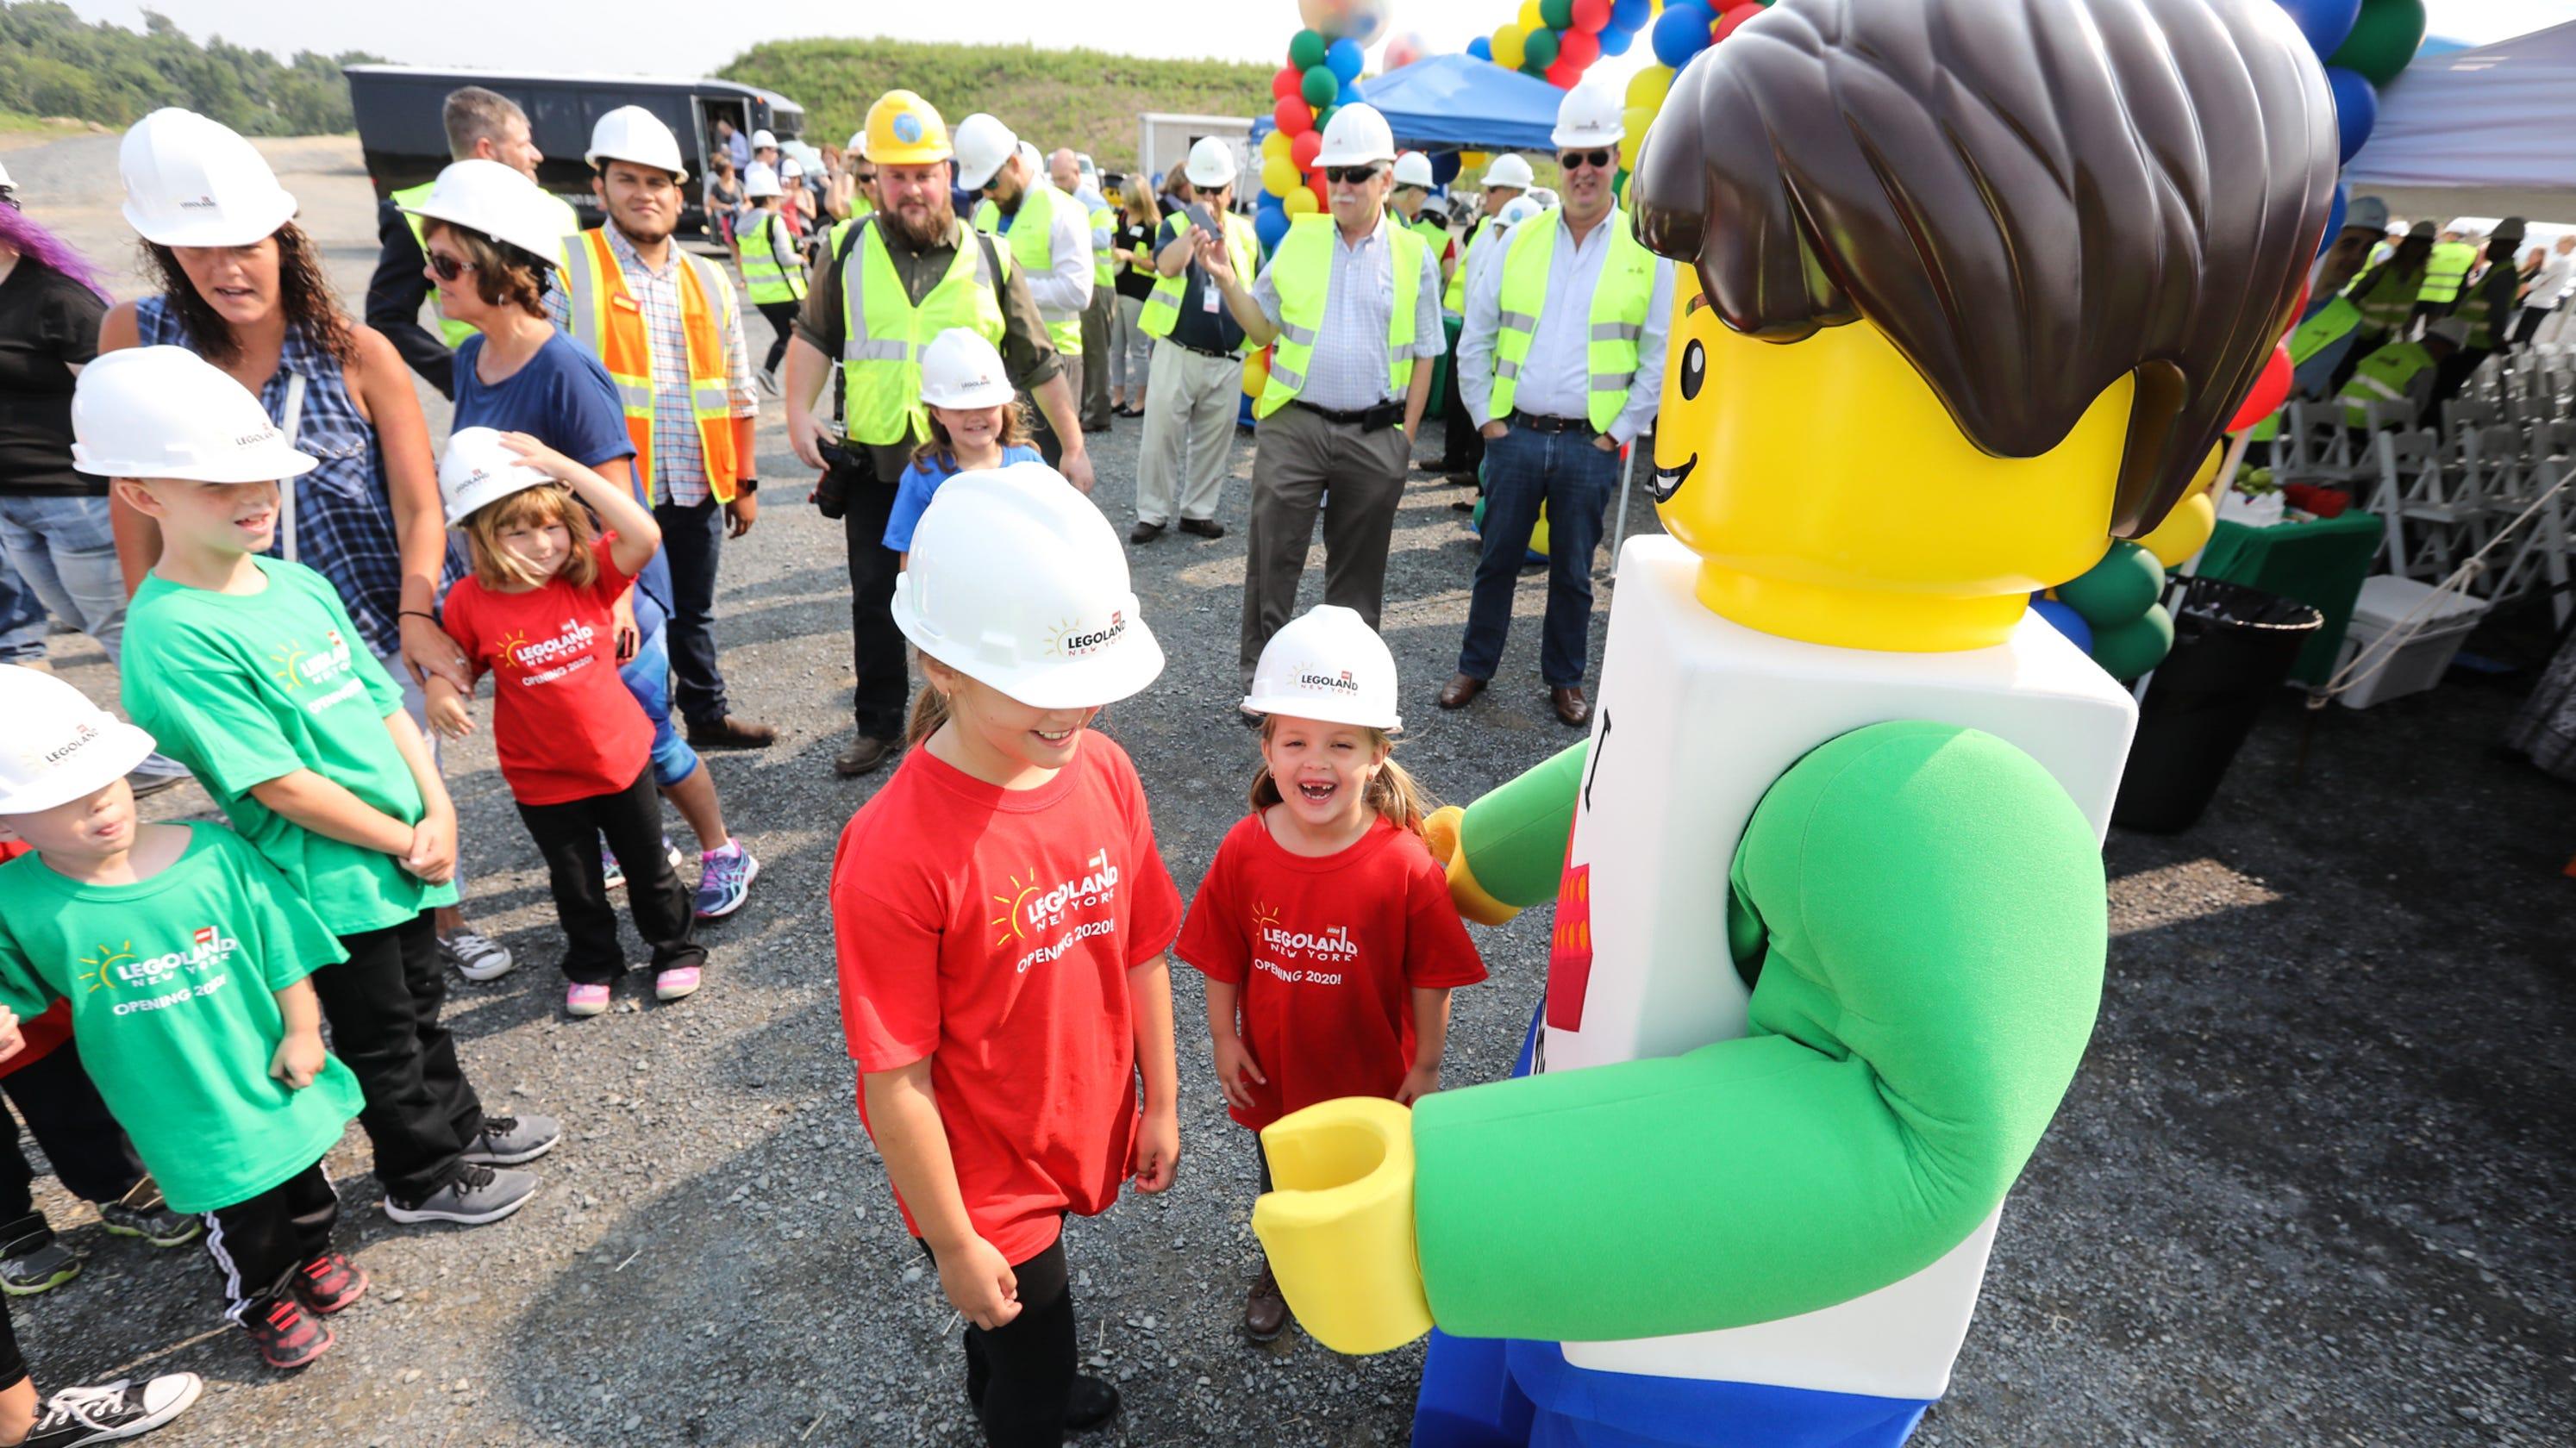 Goshen Balloon Festival 2020 Legoland New York: What you should know about the Goshen theme park